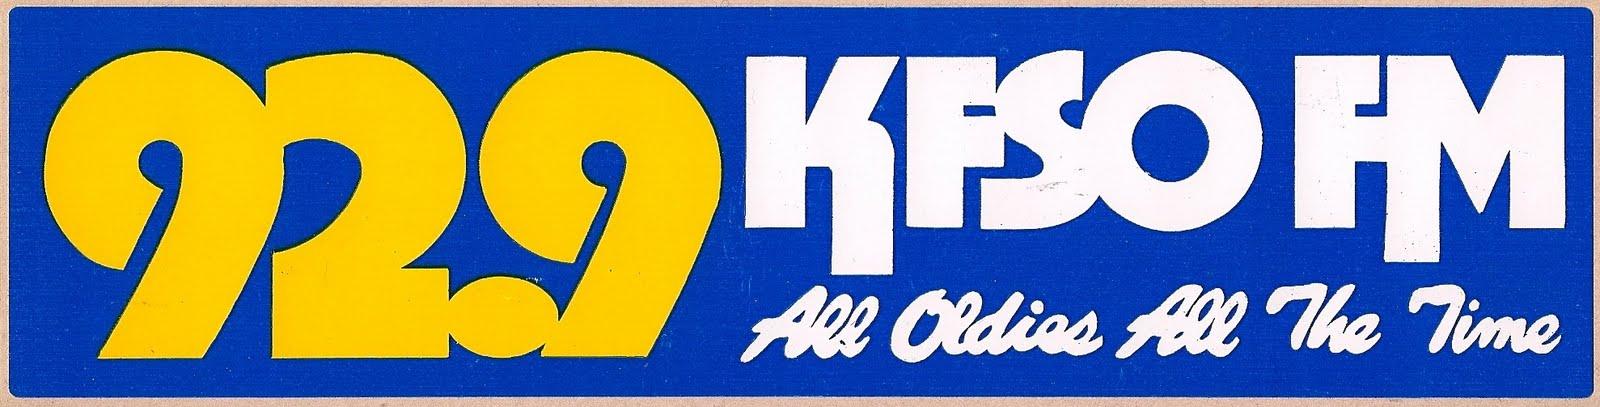 KFSO-FM